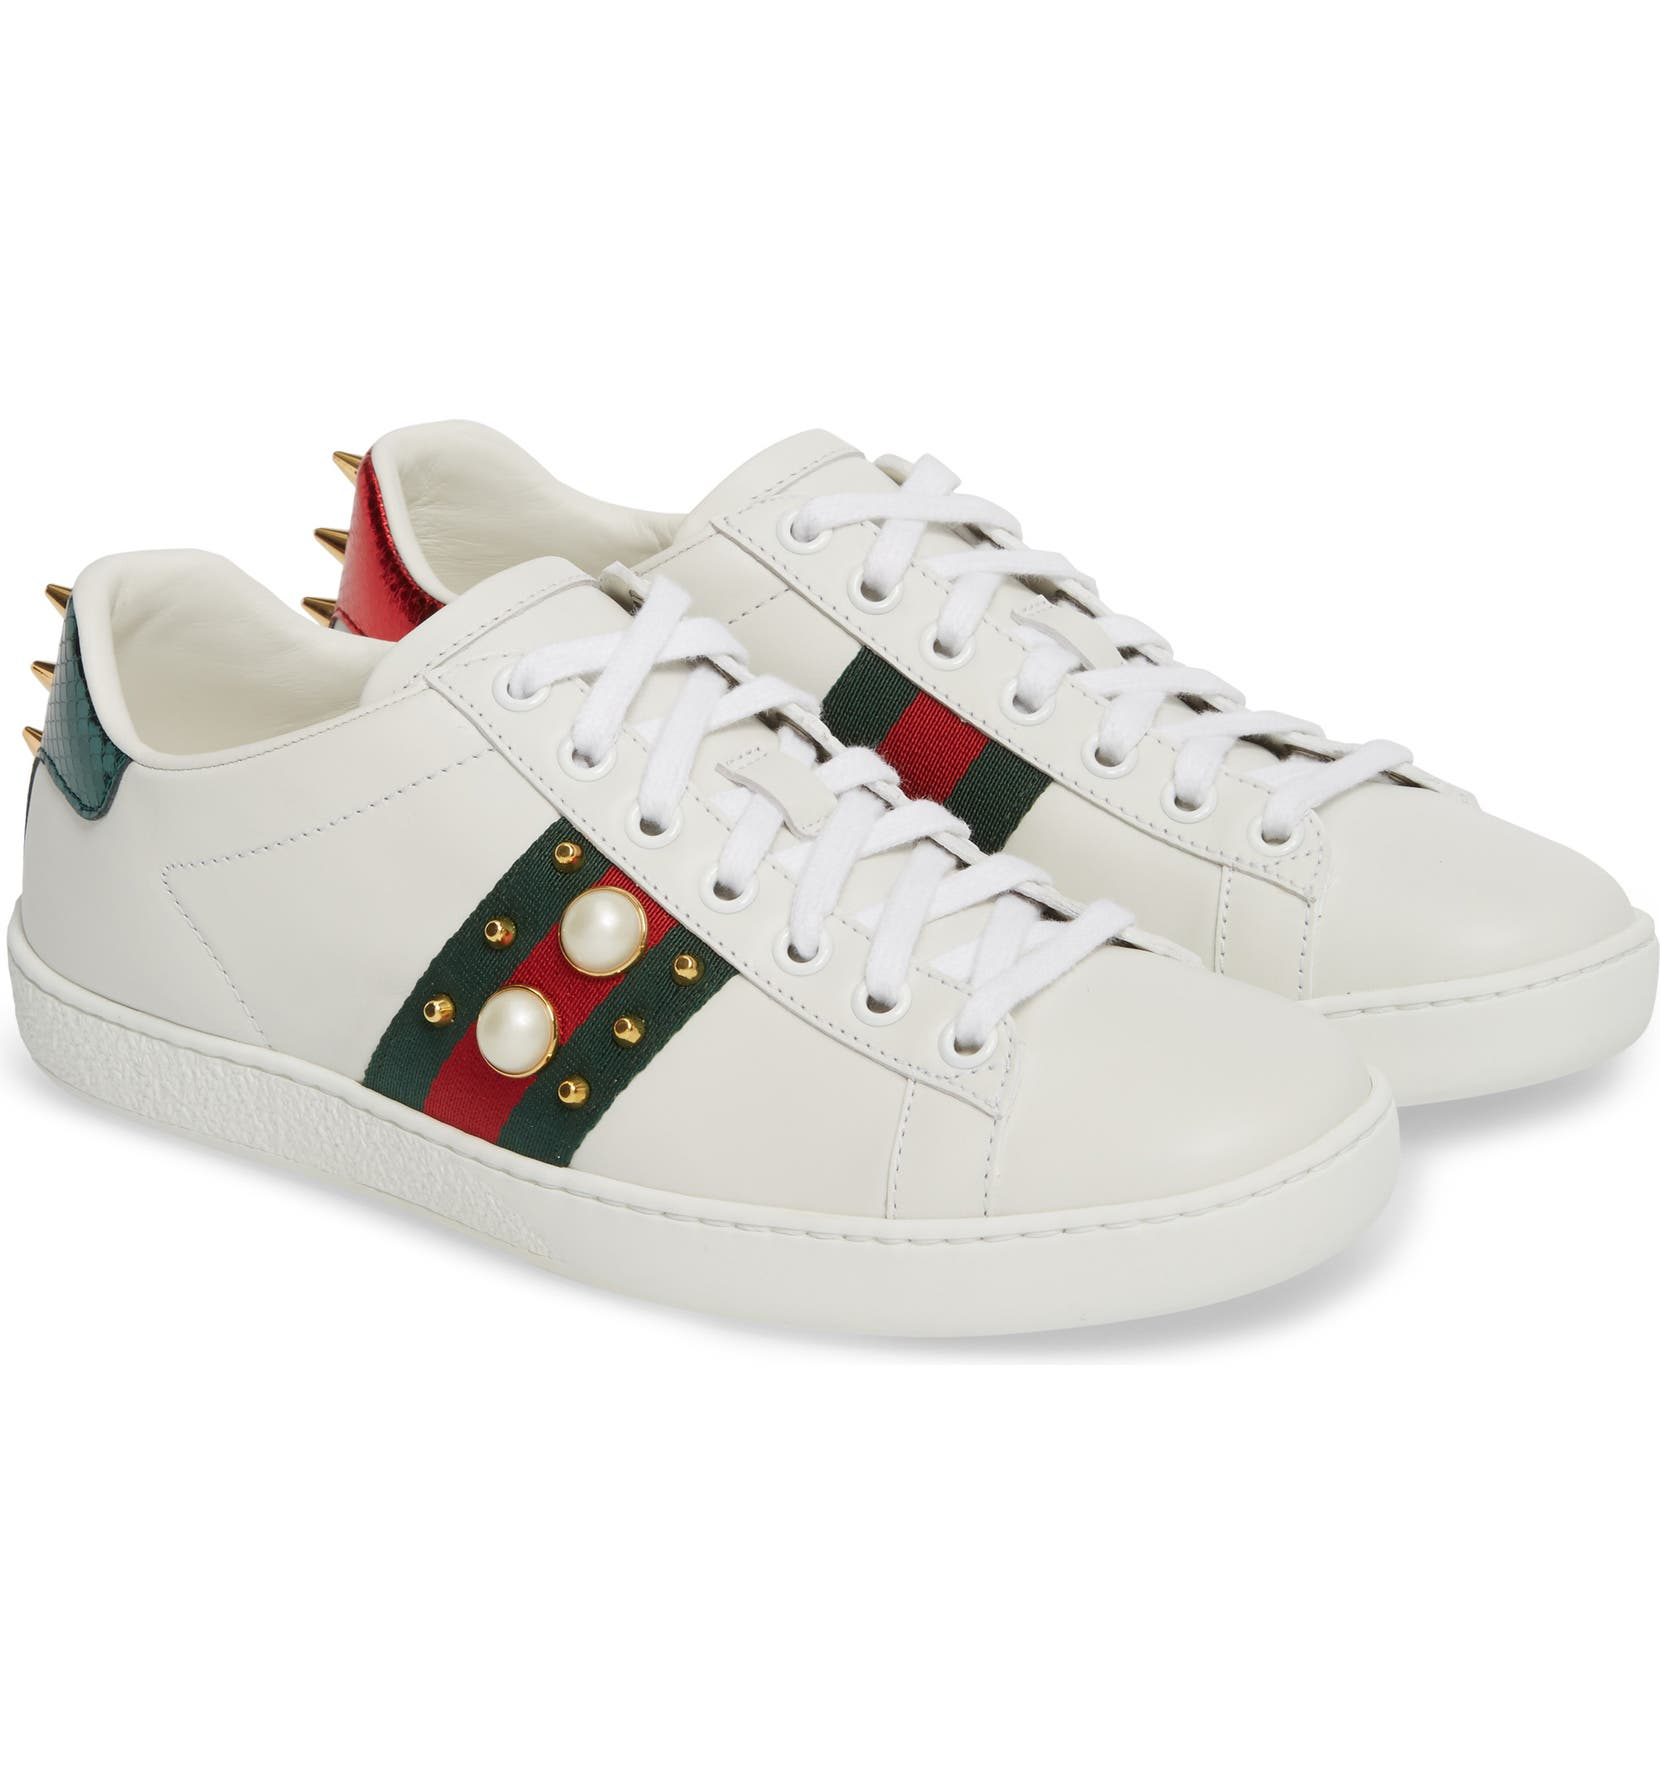 9d243b340ecb Gucci  New Ace  Low Top Sneaker (Women)